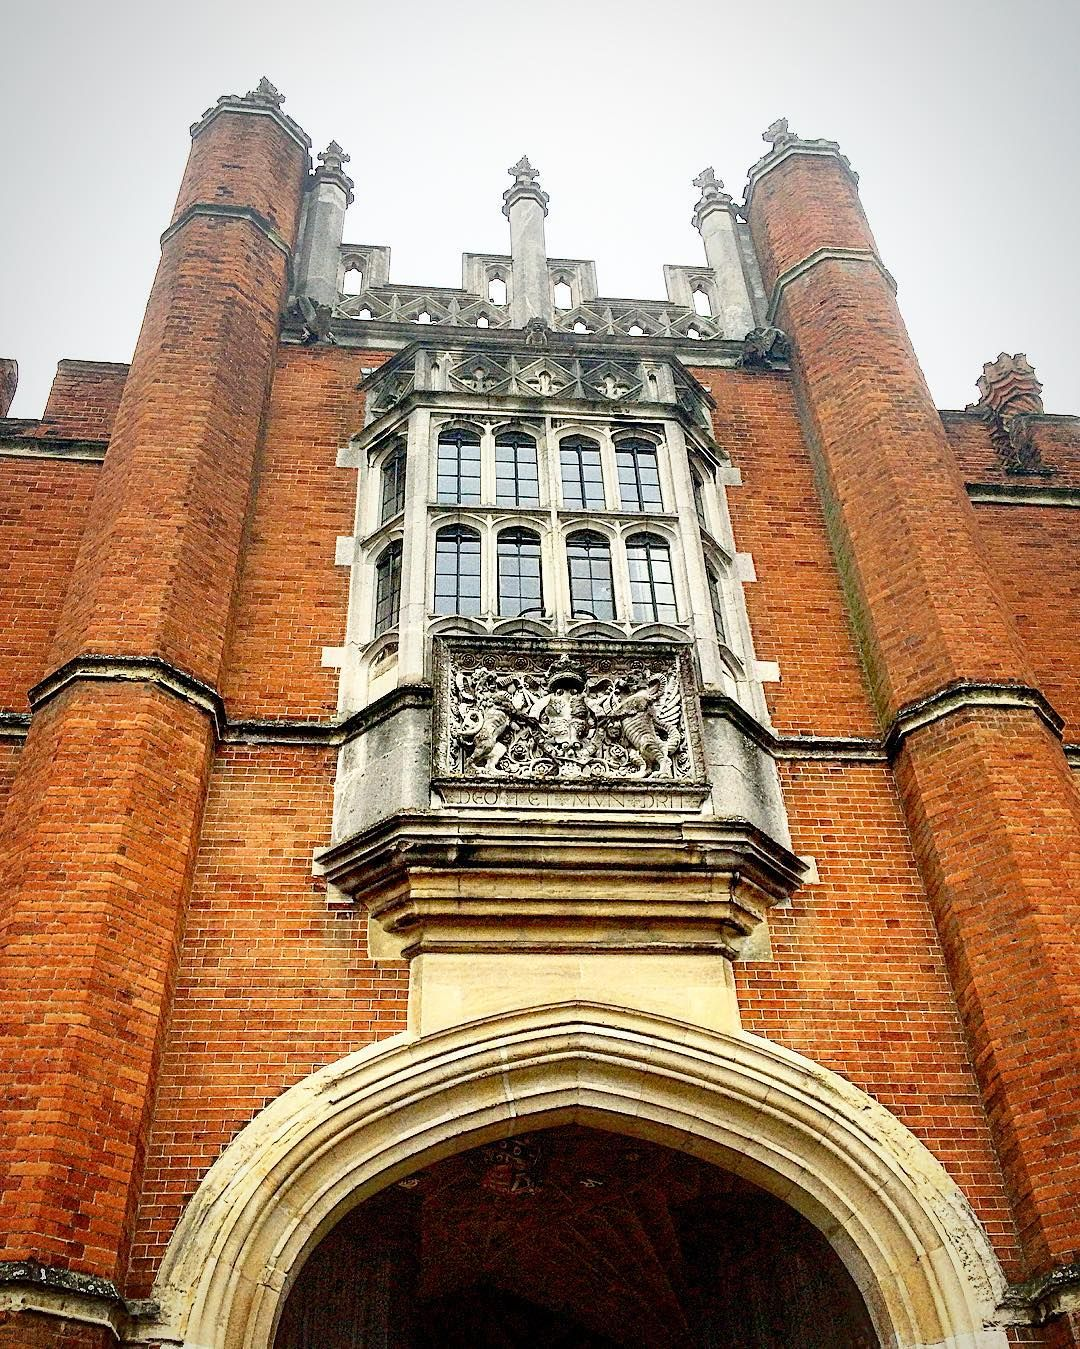 Gorgeous architecture. #royalview #hamptoncourtpalace #beautiful #MSULondon2016 #history #wonderful #architecture #architecturelovers #instaarchitecture #awesome #amazing #uk #england #europe #studyabroad by alishakempher